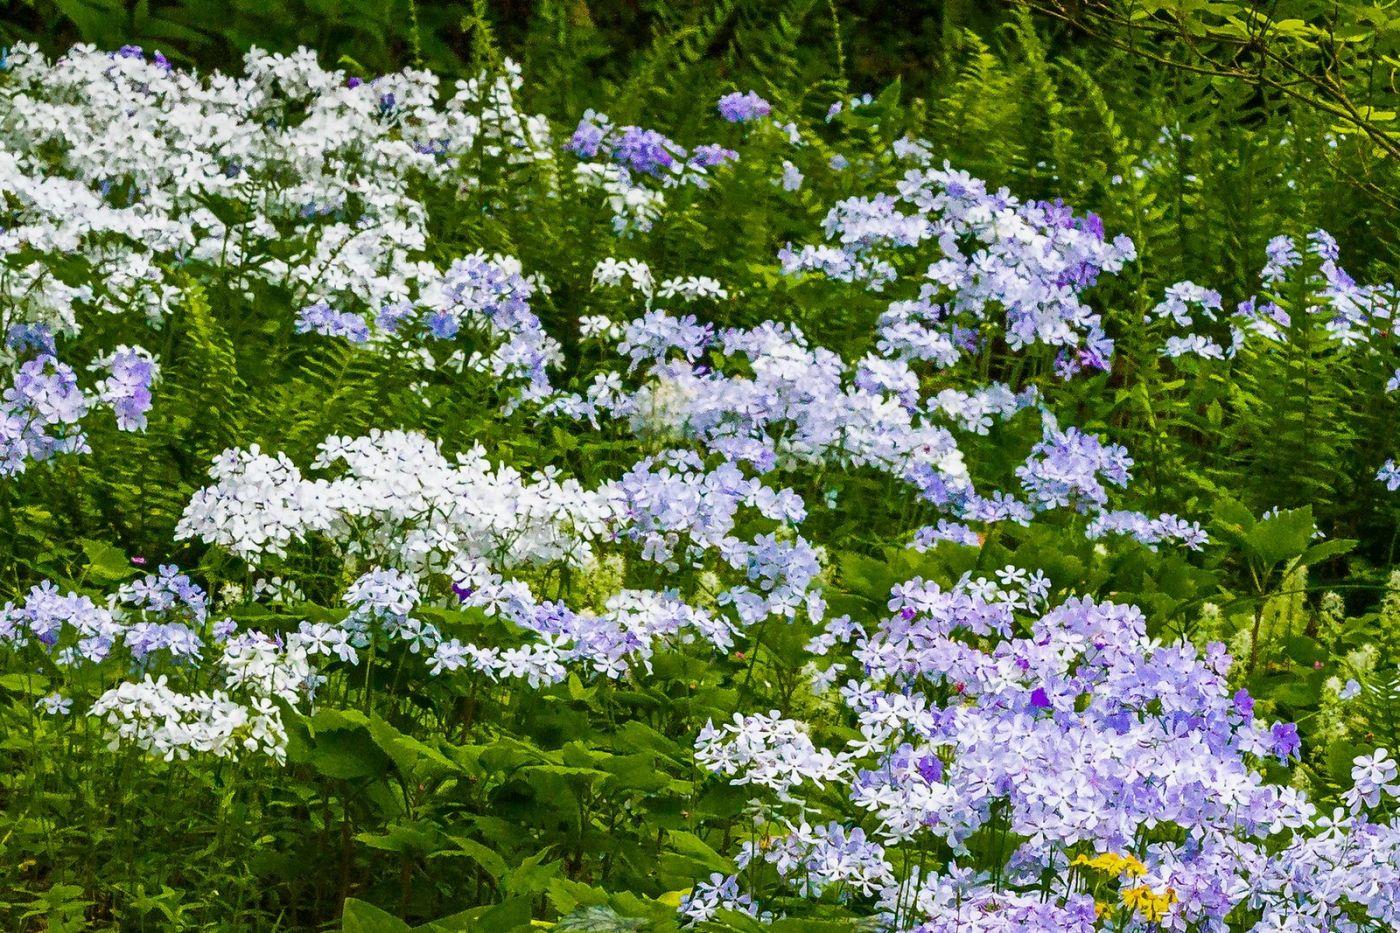 Chanticleer花园,有梦想的季节_图1-5